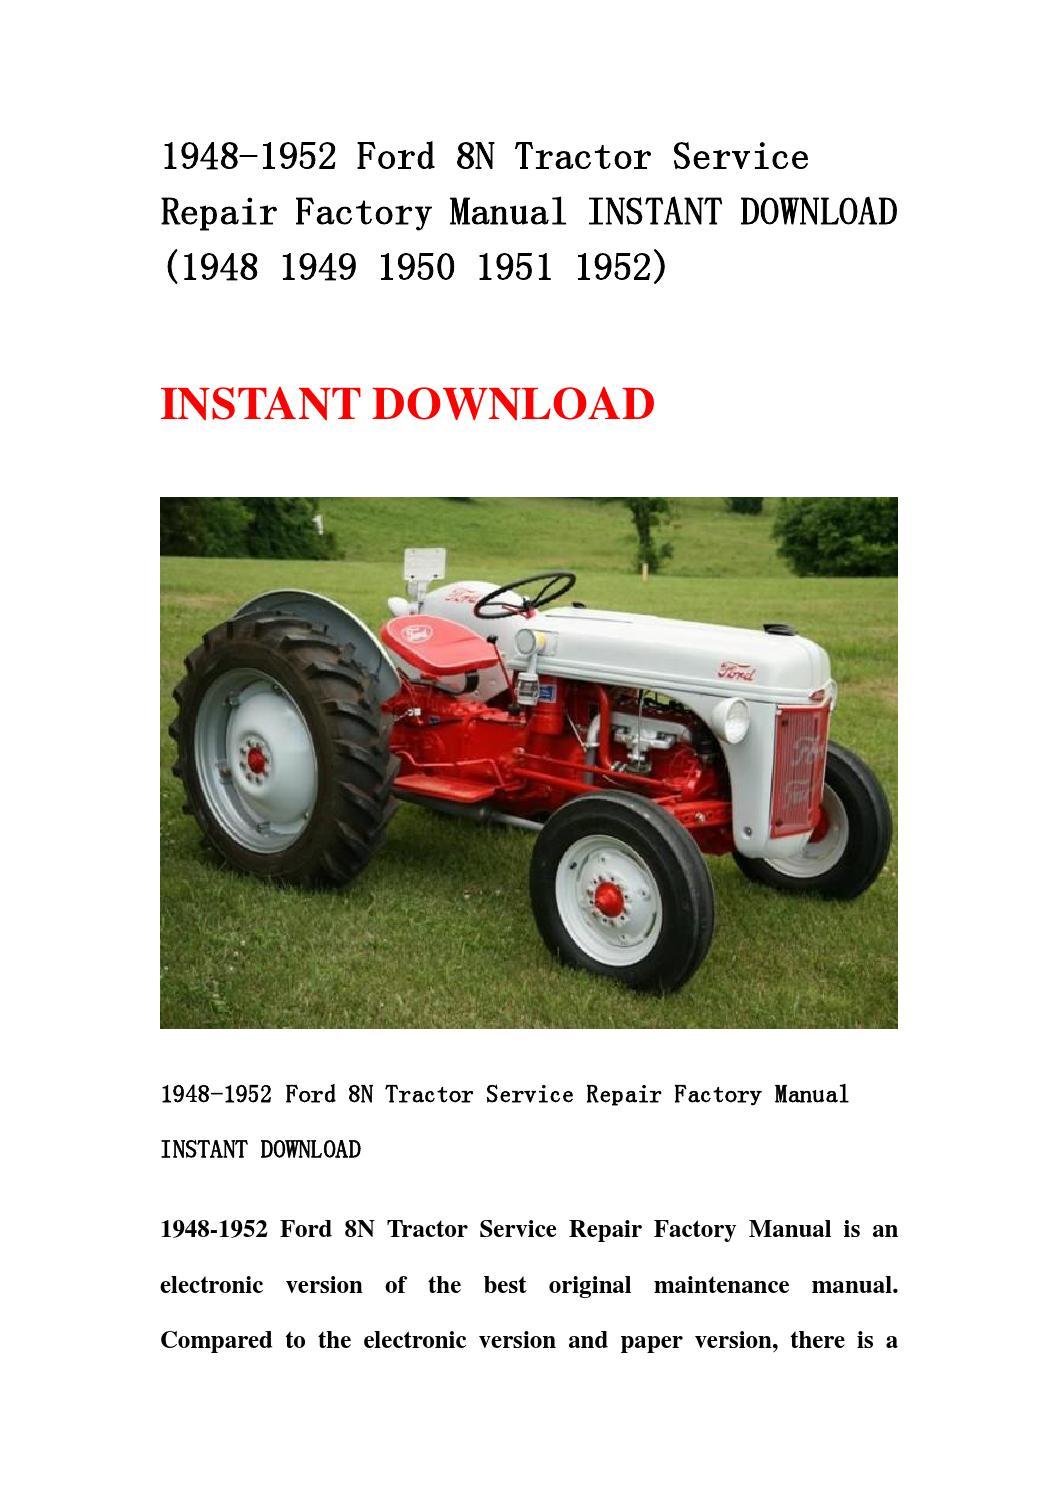 1948 Ford Tractor Parts Is Your Car 8n Diagram 1928 Repair Manual Good Owner Guide Website